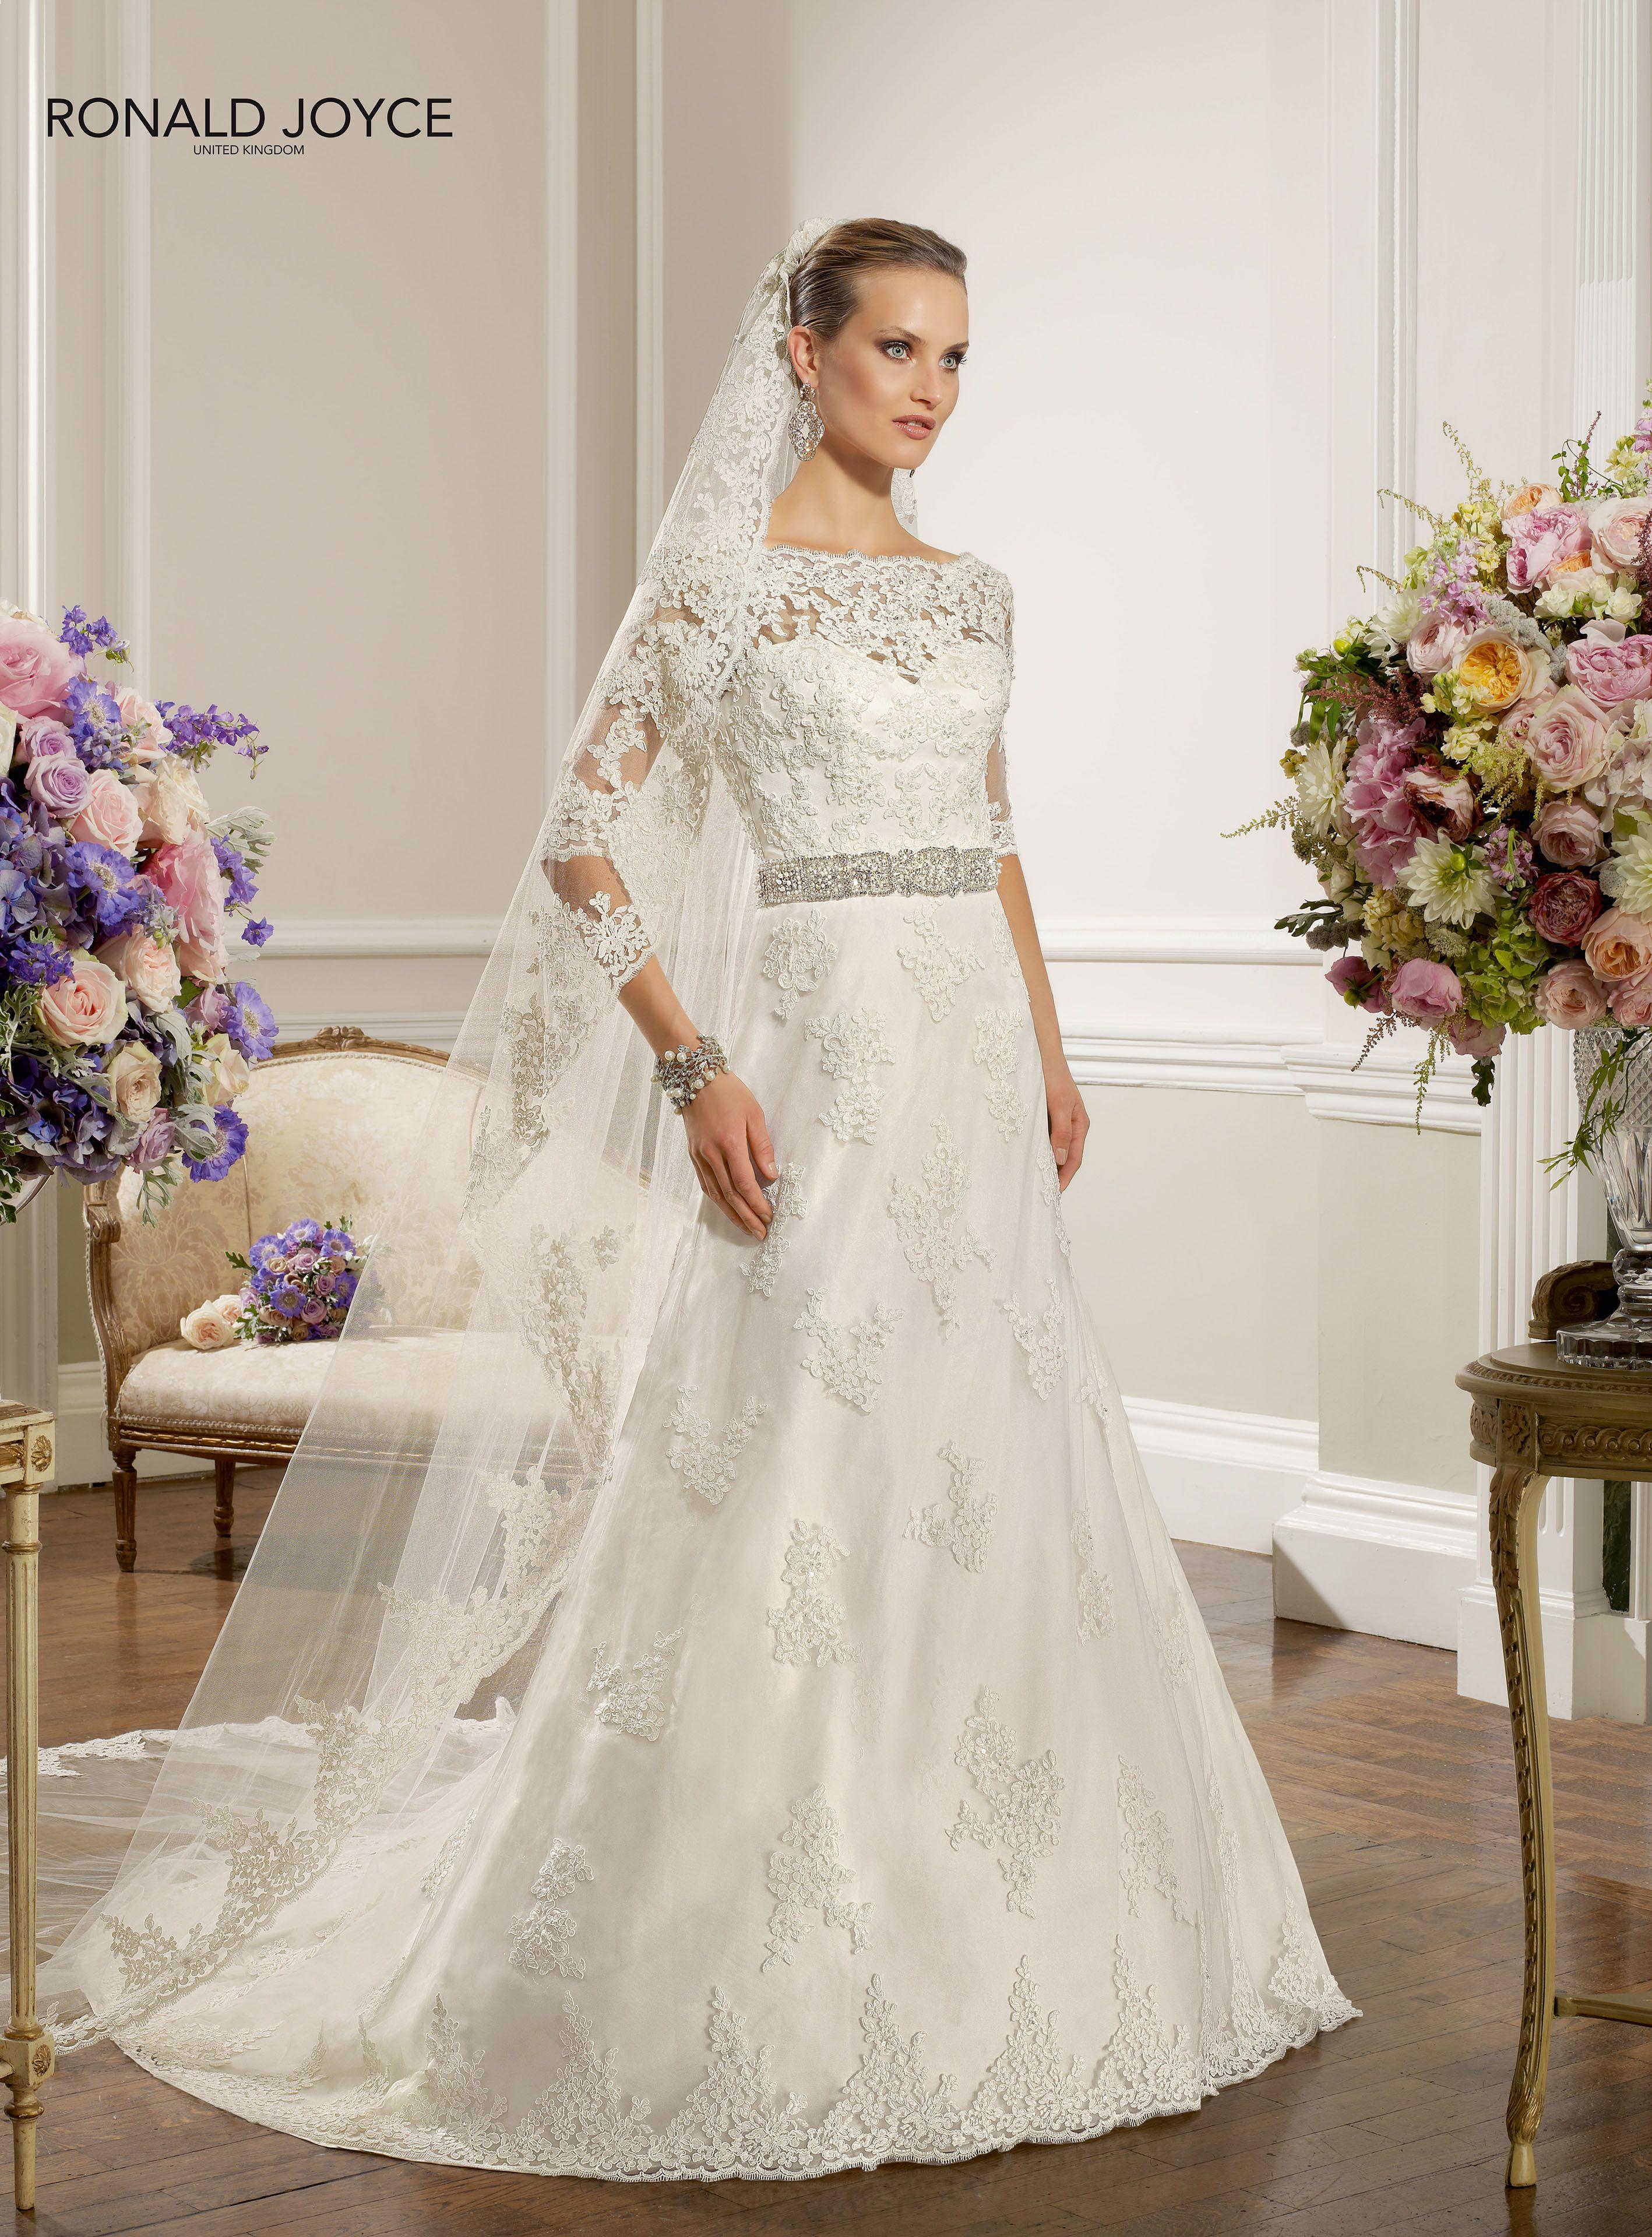 Ronald Joyce 67022 #Becky #lace #67032veil #sleeves | Wedding dress ...